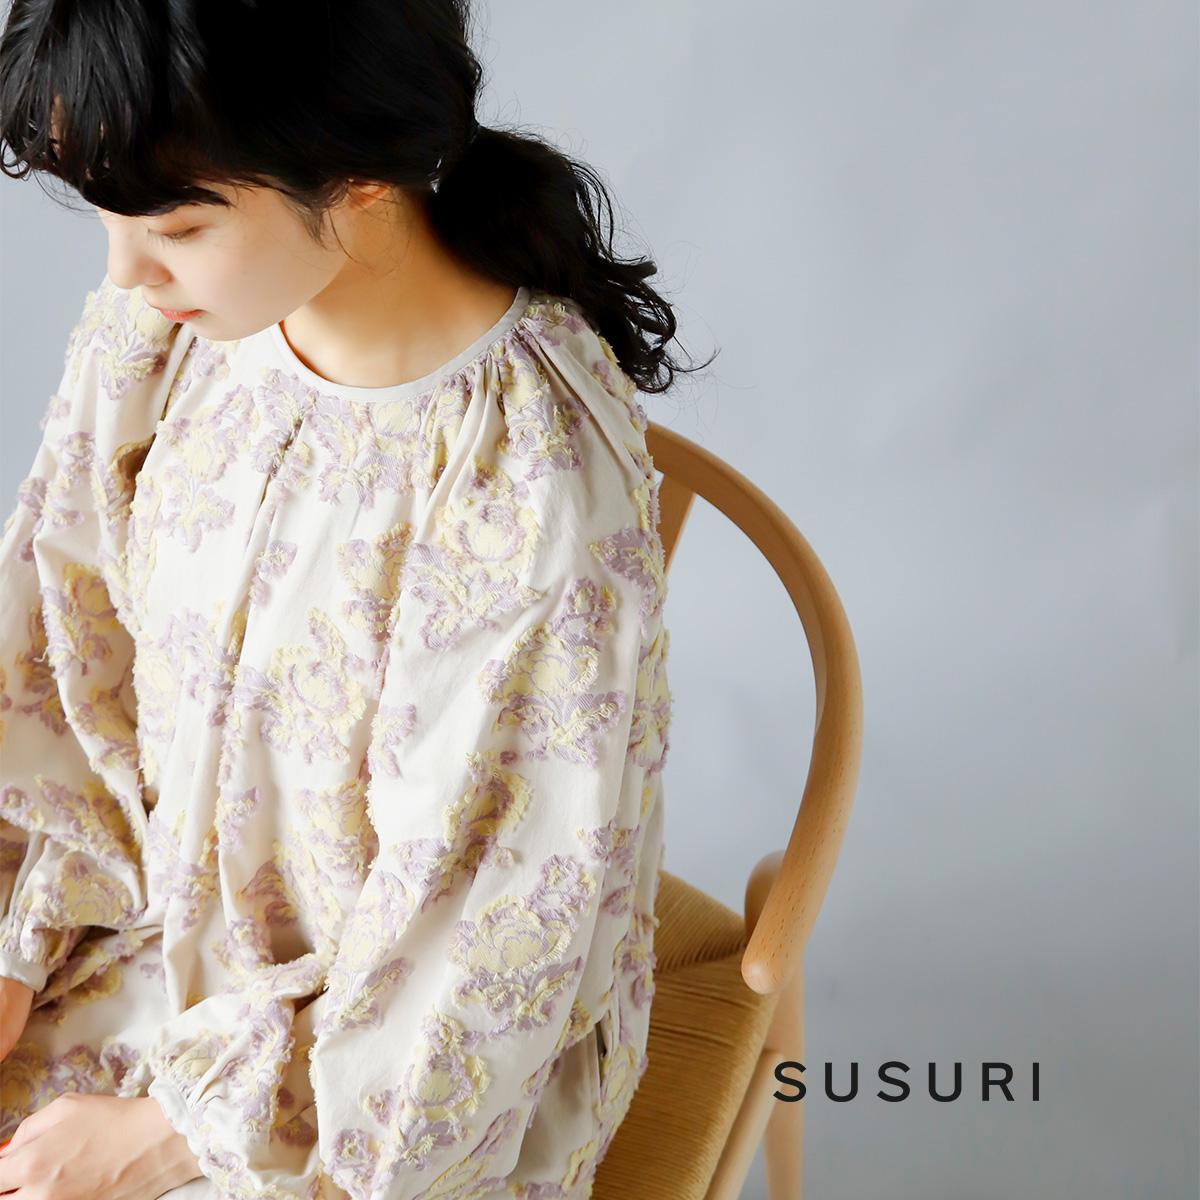 susuri(ススリ)コットンフラワージャガードビショップドレス 21-251